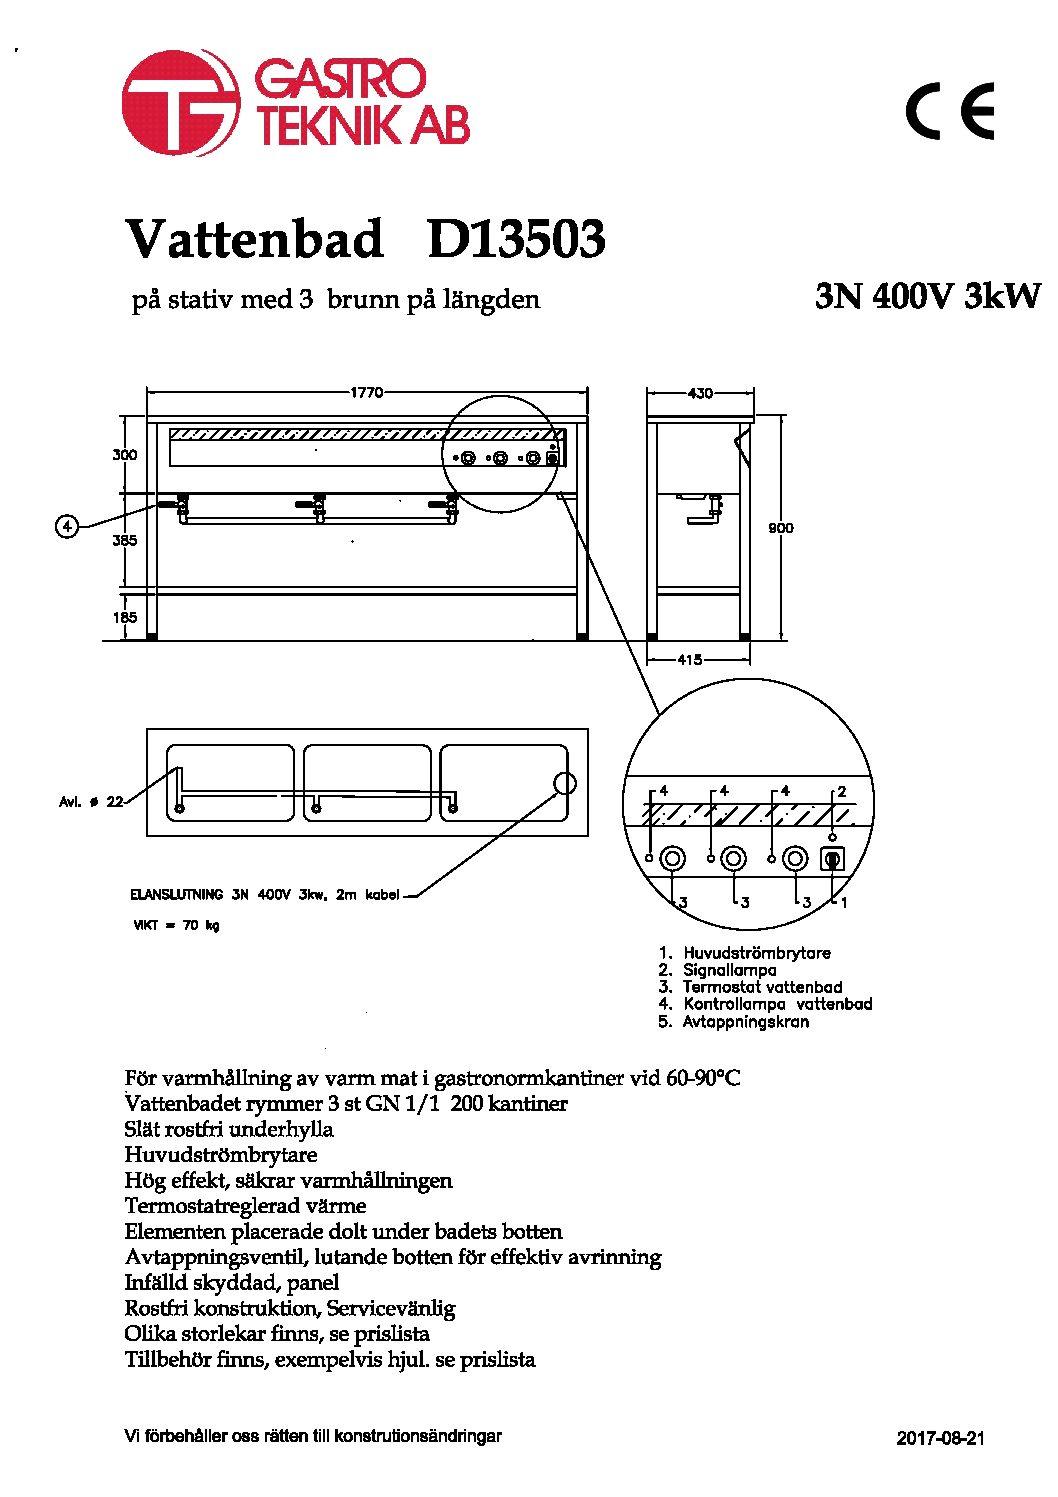 D13503